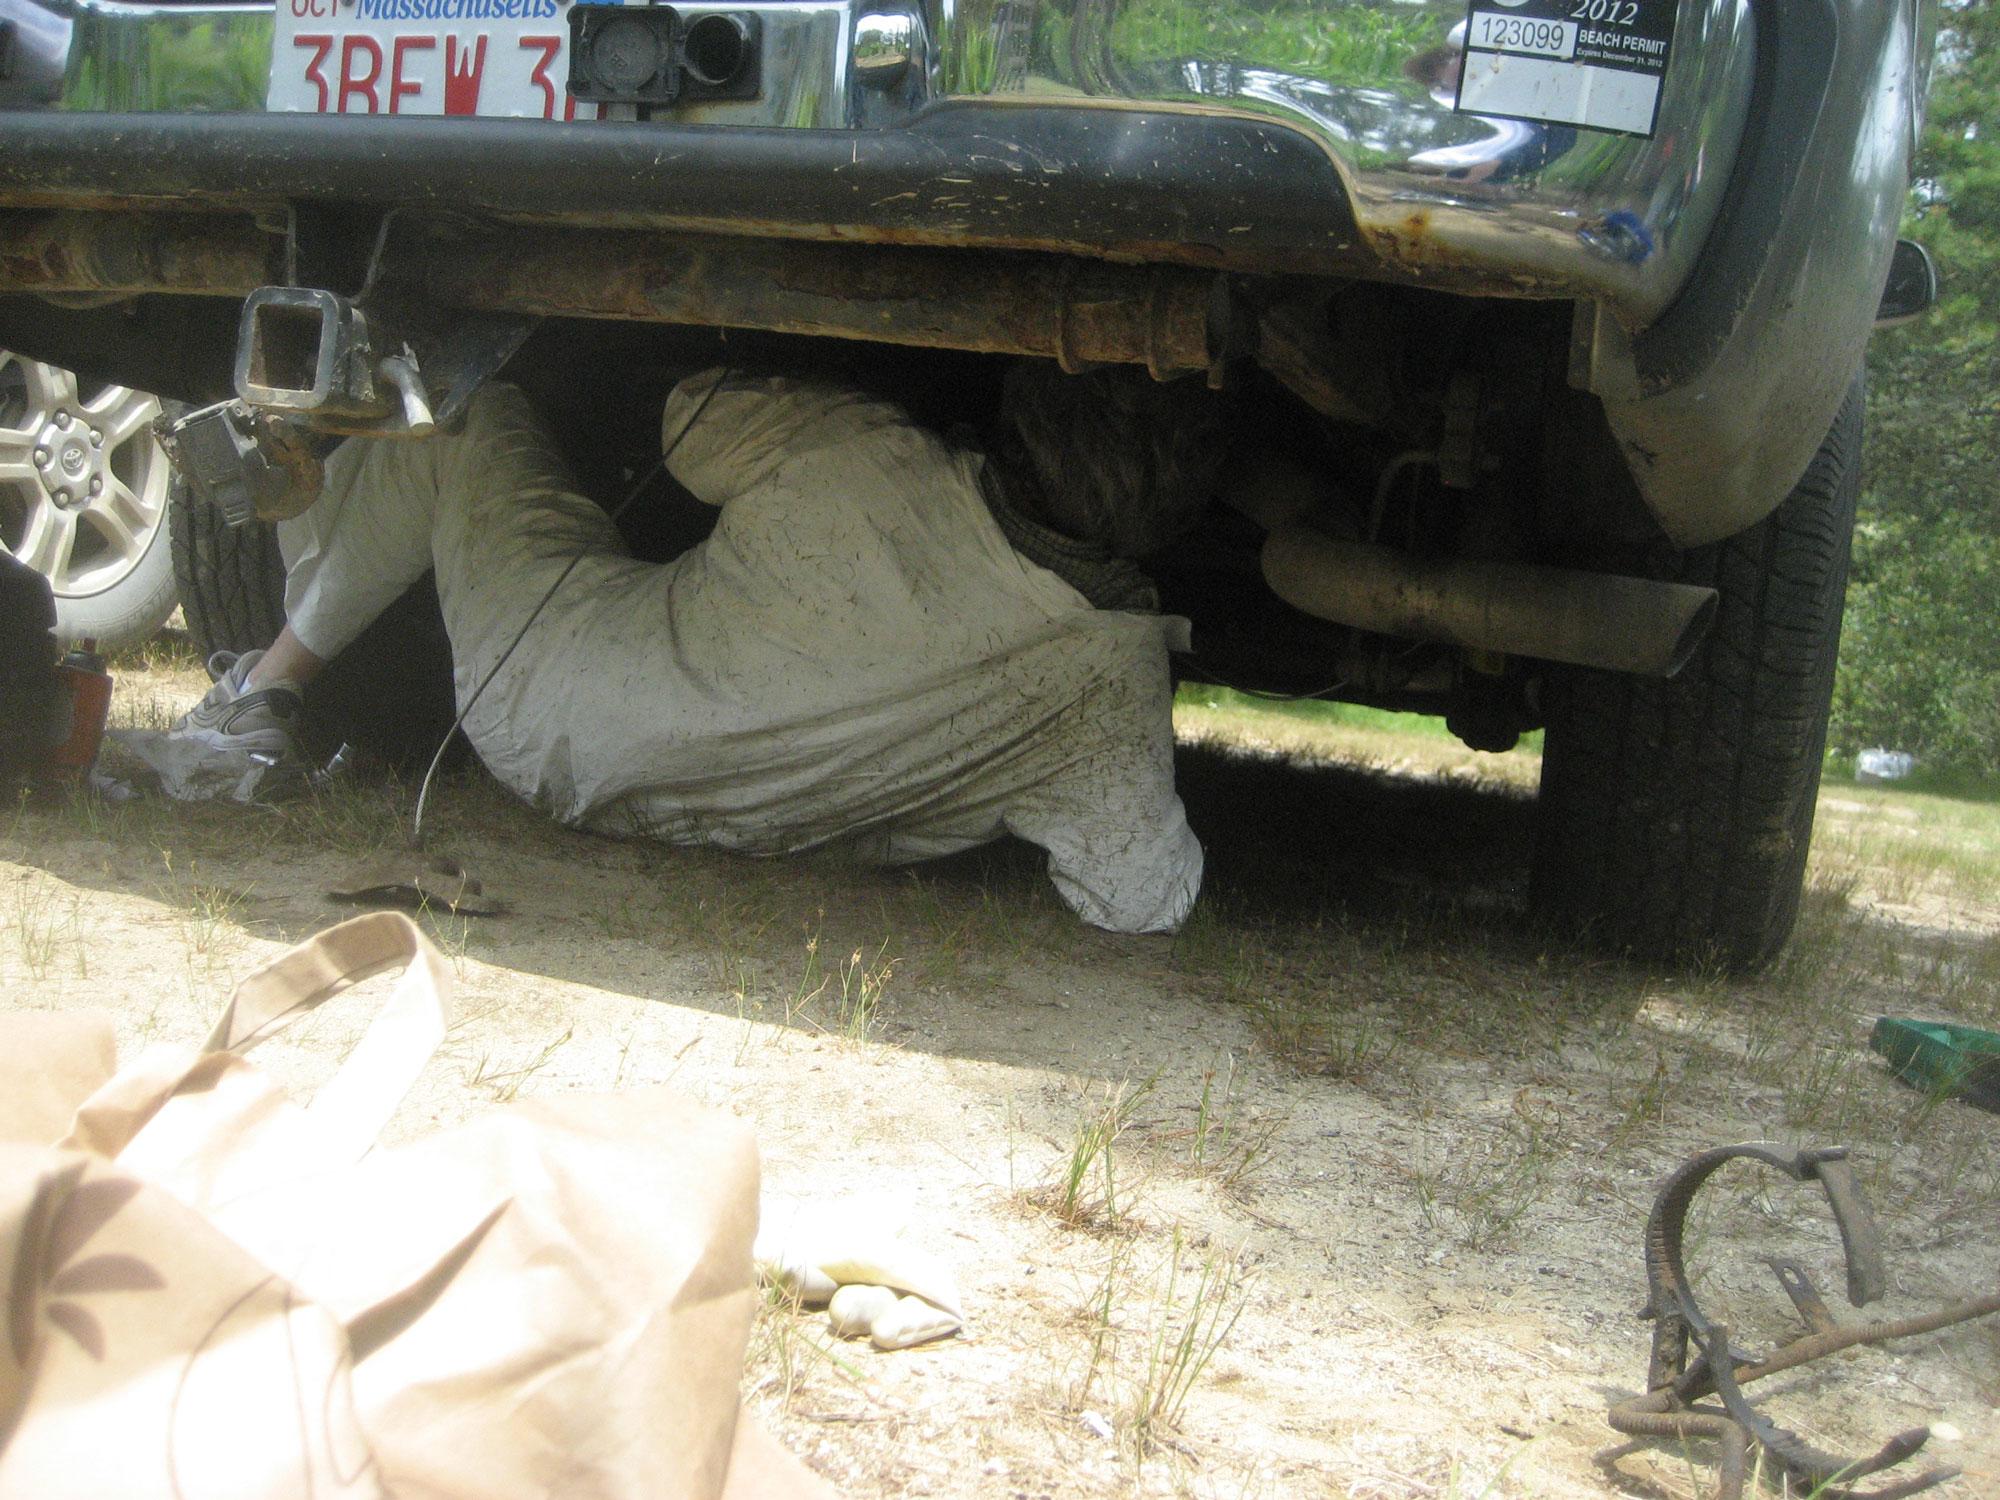 On-island brake line replacement. Isn't vacation fun?